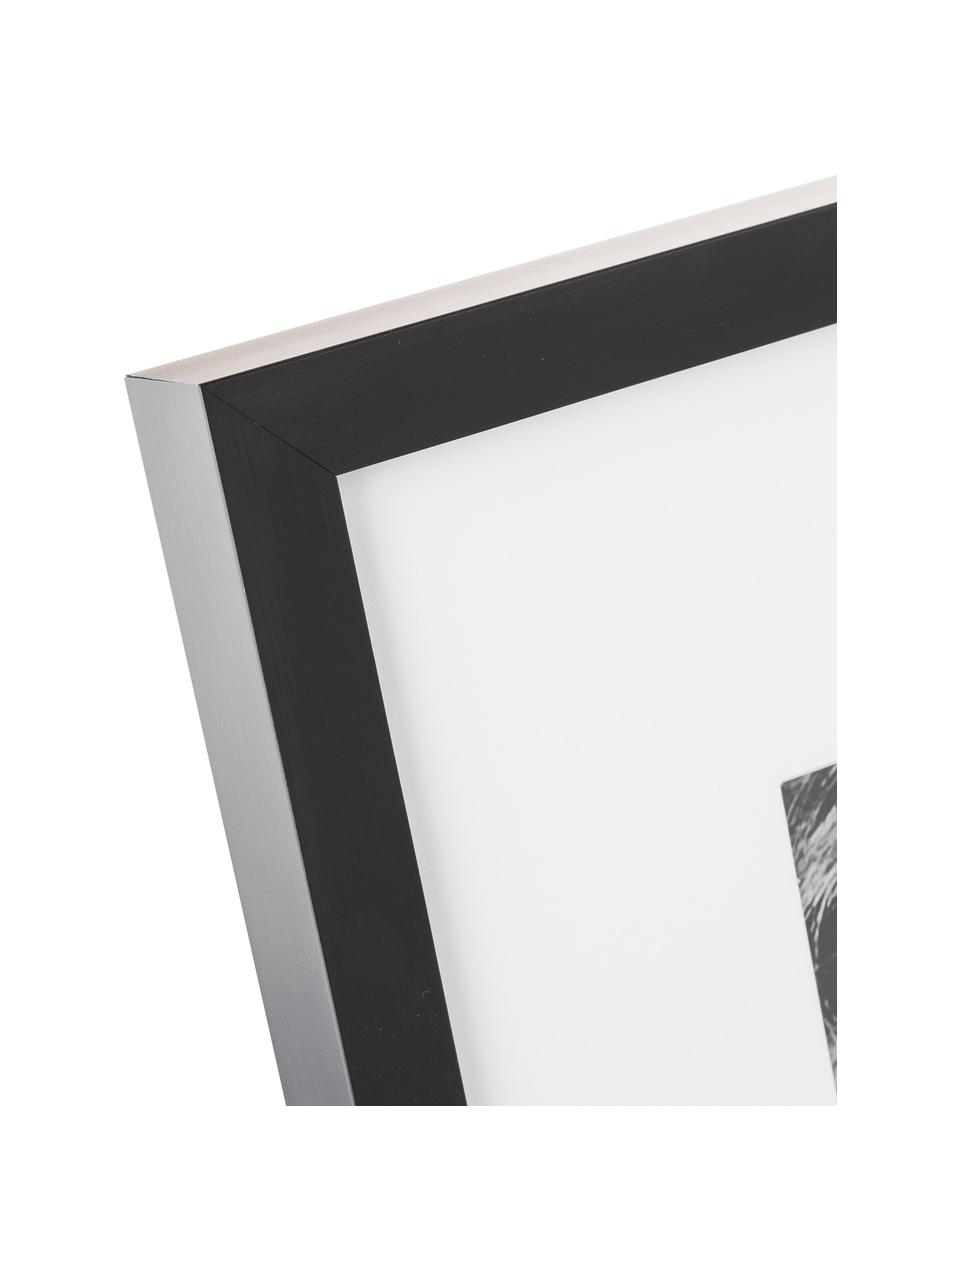 Stampa digitale incorniciata Lion Close Up, Immagine: stampa digitale, Cornice: telaio in materiale sinte, Nero, bianco, L 40 x A 40 cm